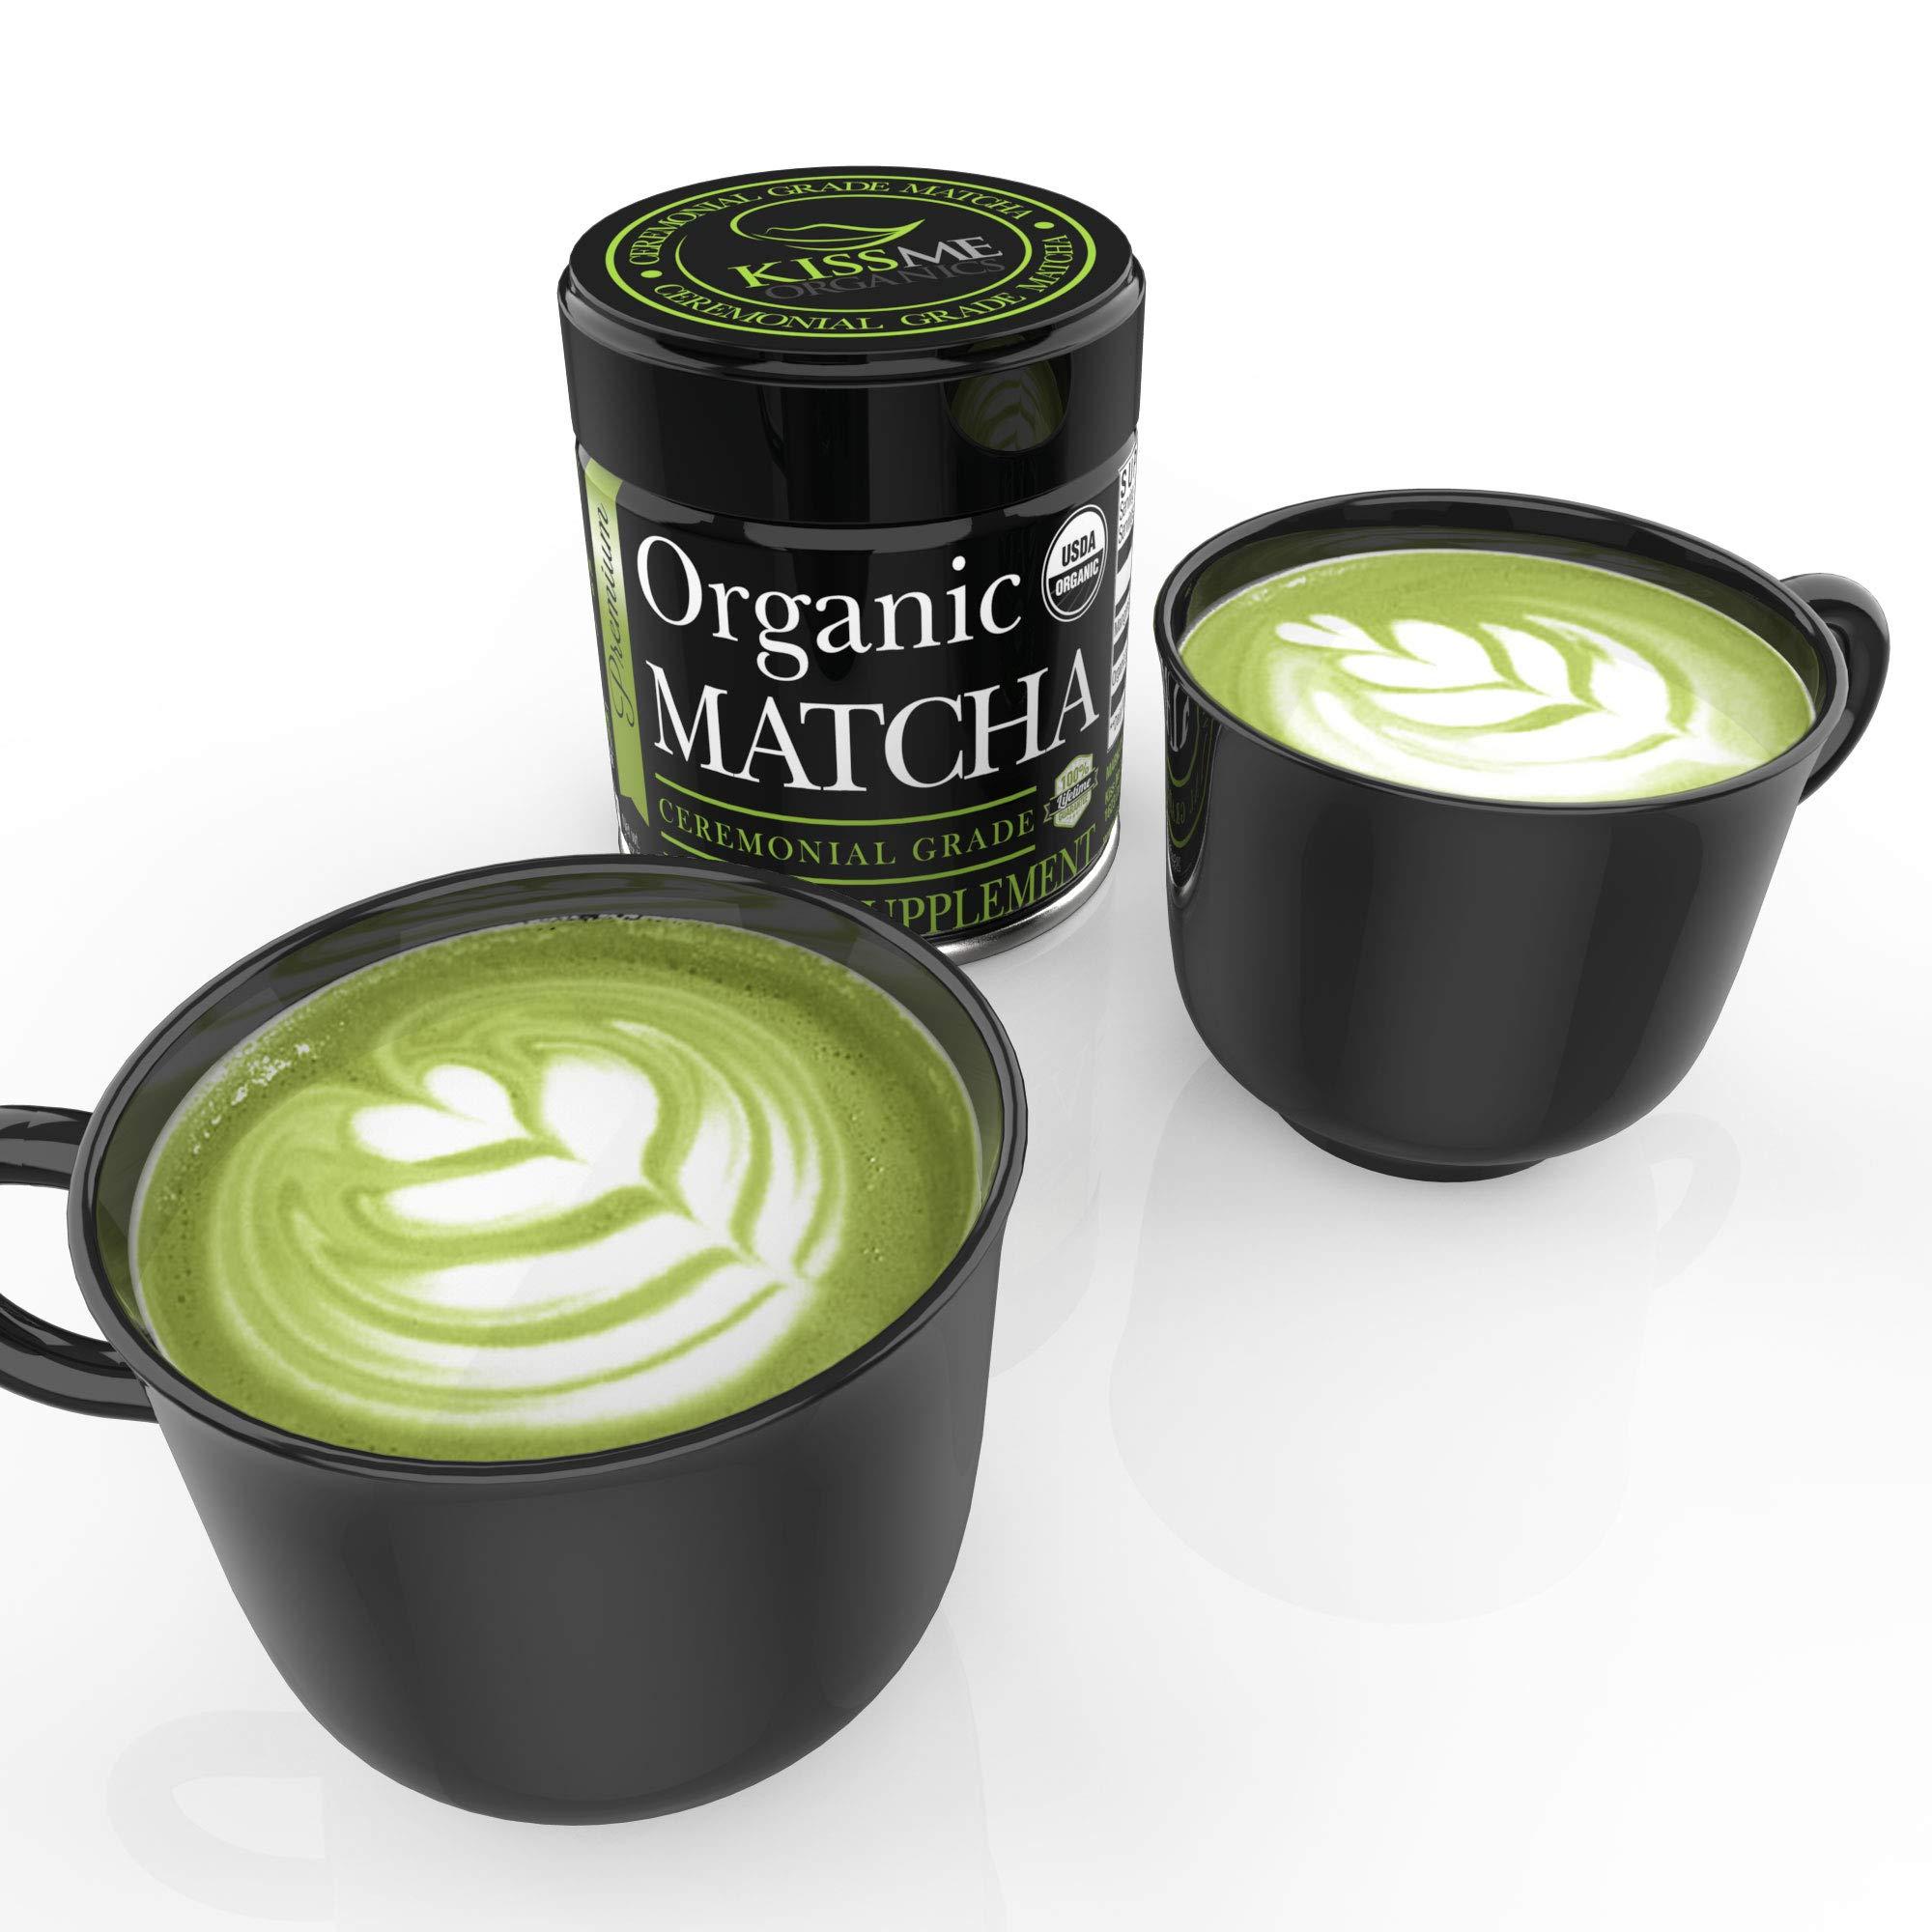 Matcha Green Tea Powder - Powerful Antioxidant Japanese Organic (Ceremonial 1 oz) by Kiss Me Organics